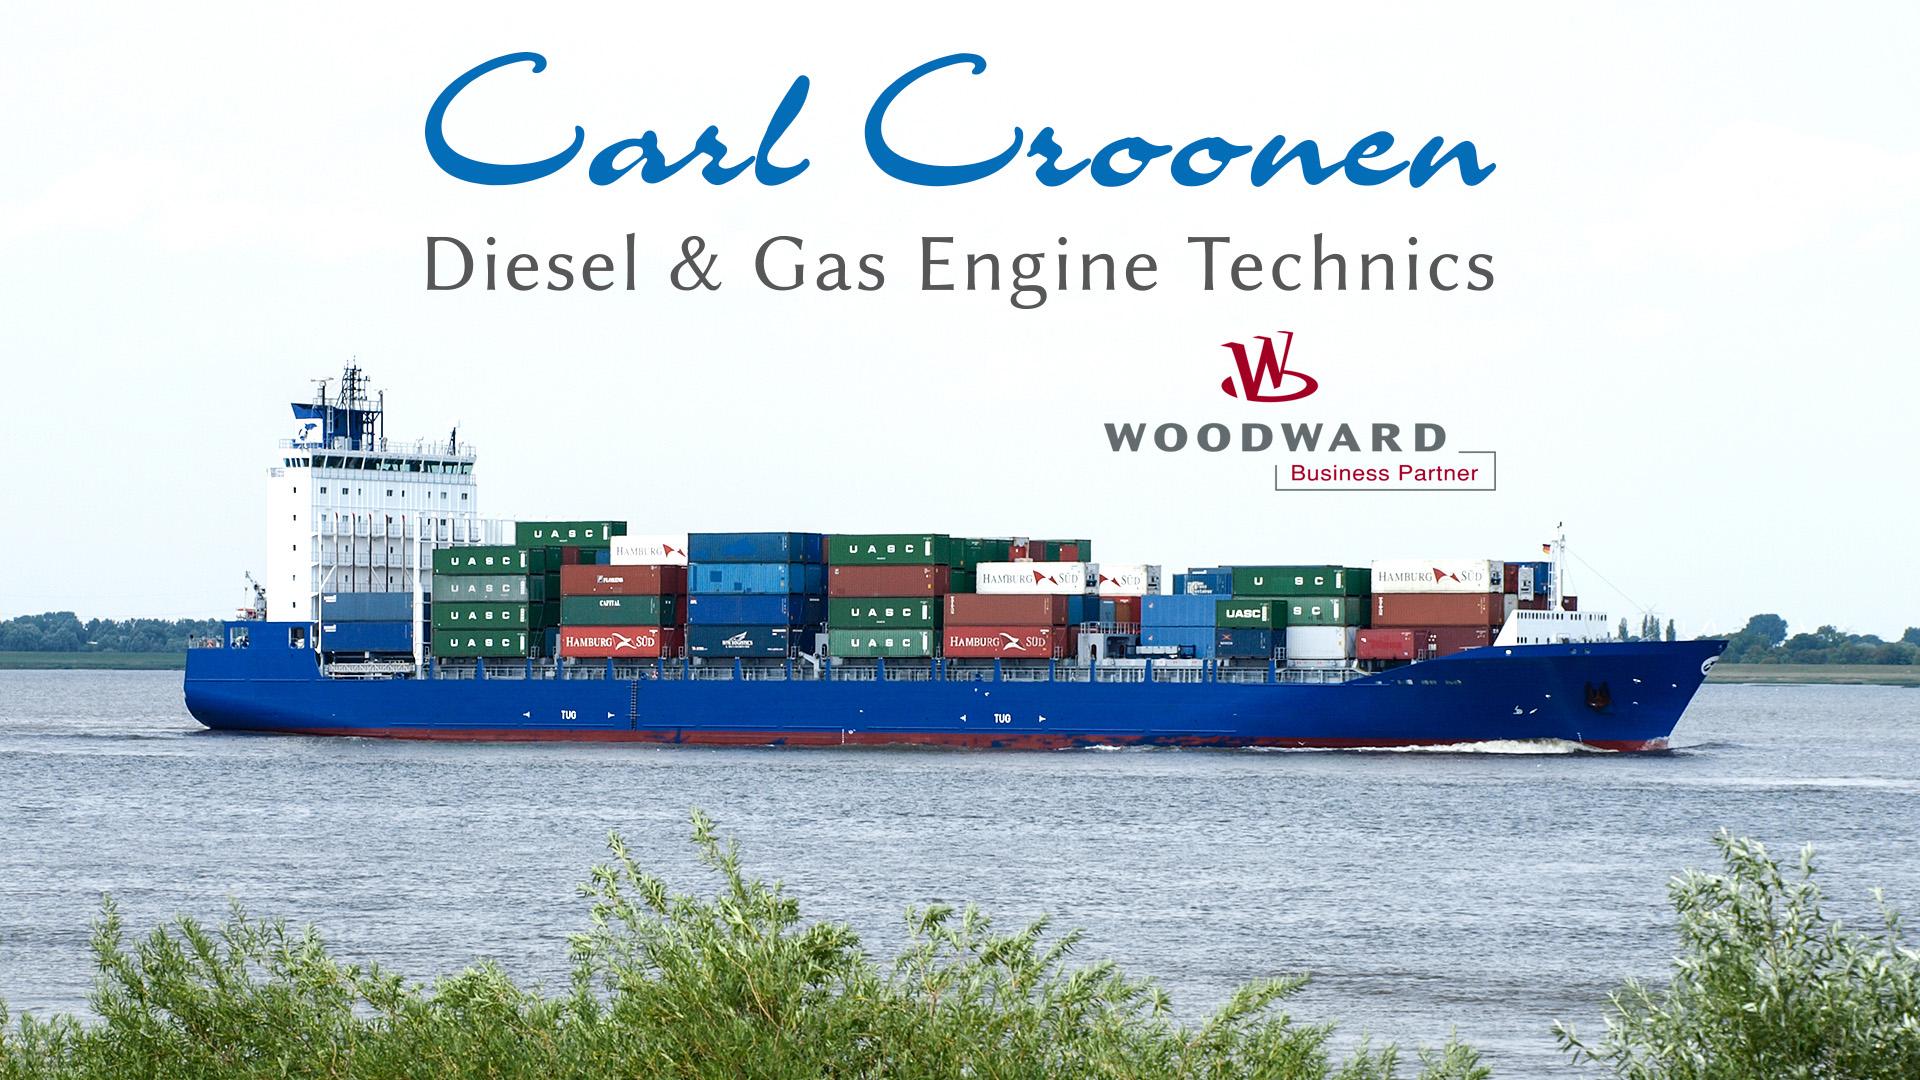 cc_woodward_partner01